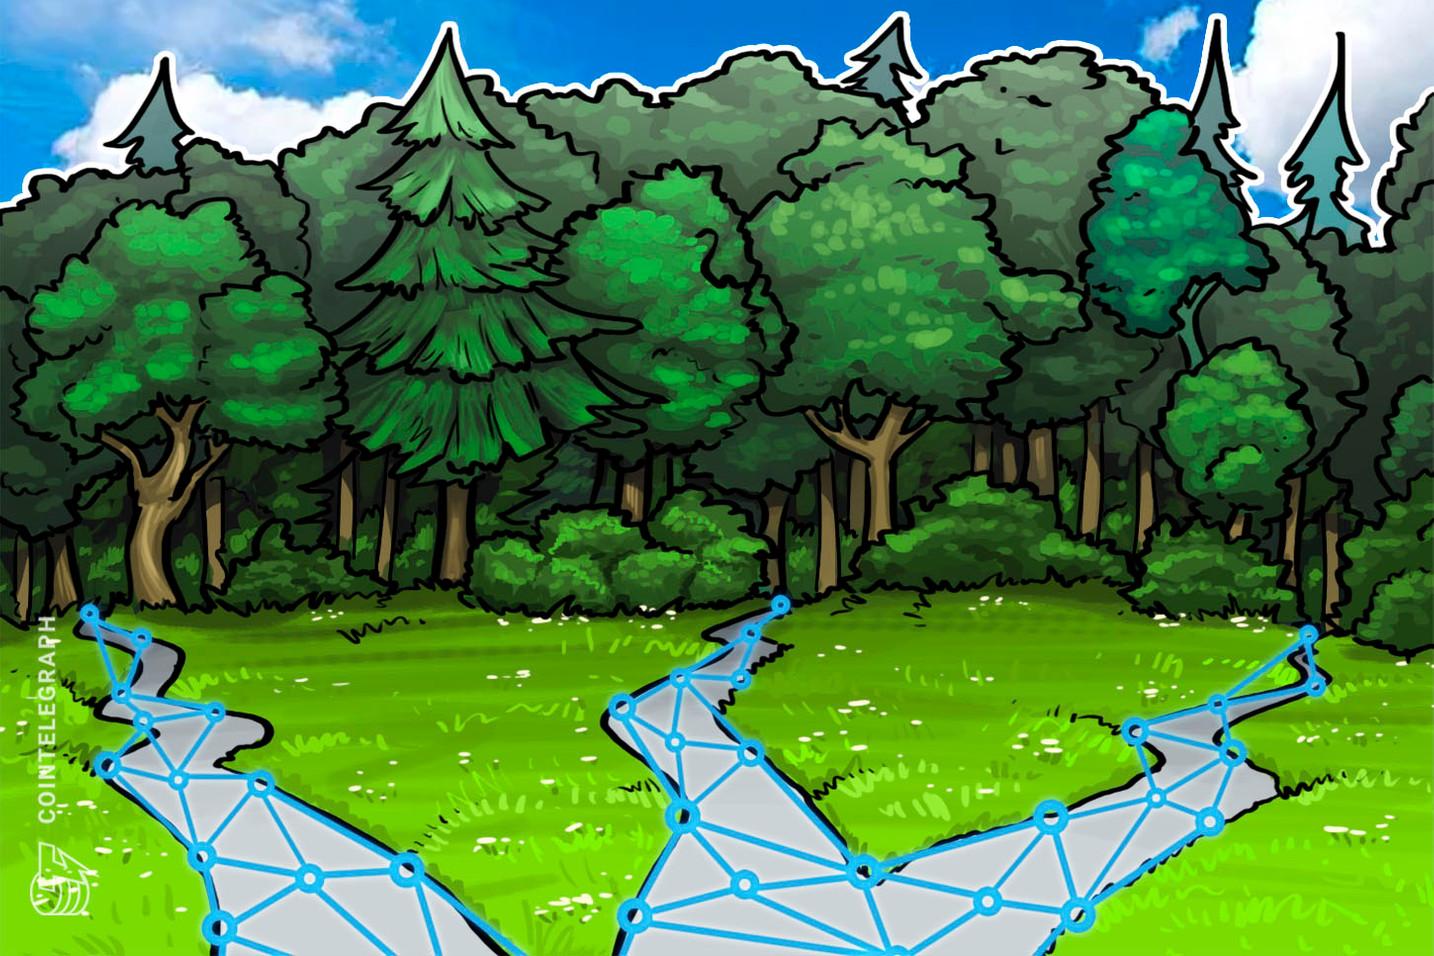 Blockchain-Firma BitFury: Partnerschaft mit UN bei Waldprojekt in Kasachstan